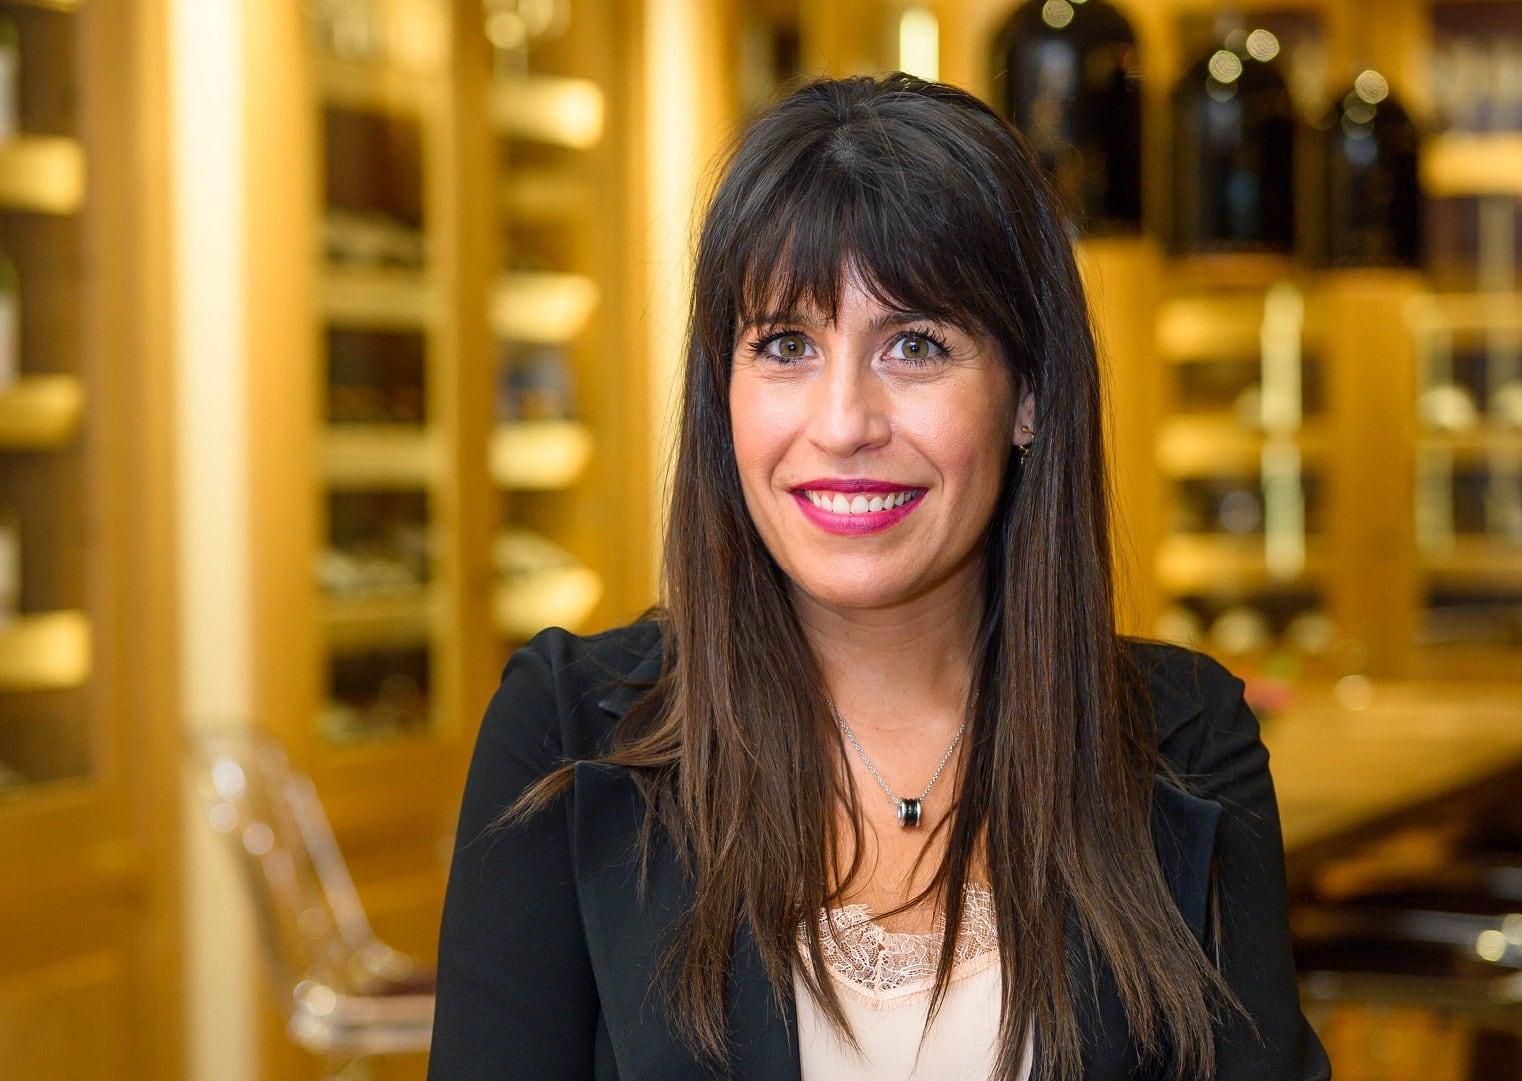 Carmen Giganto, la beauty hunter del momento